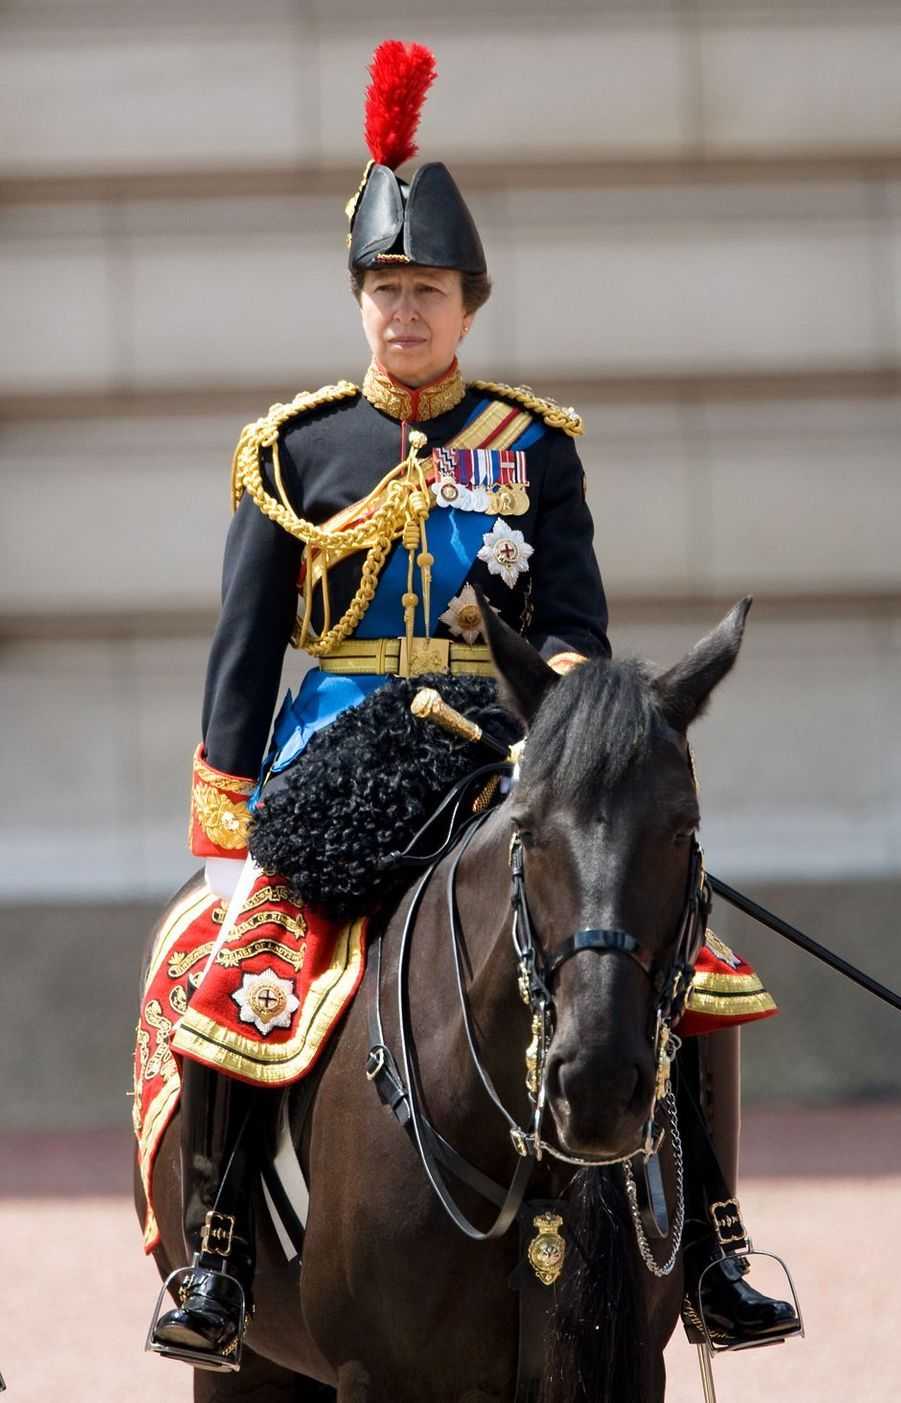 La princesse Anne d'Angleterre, 14 juin 2008